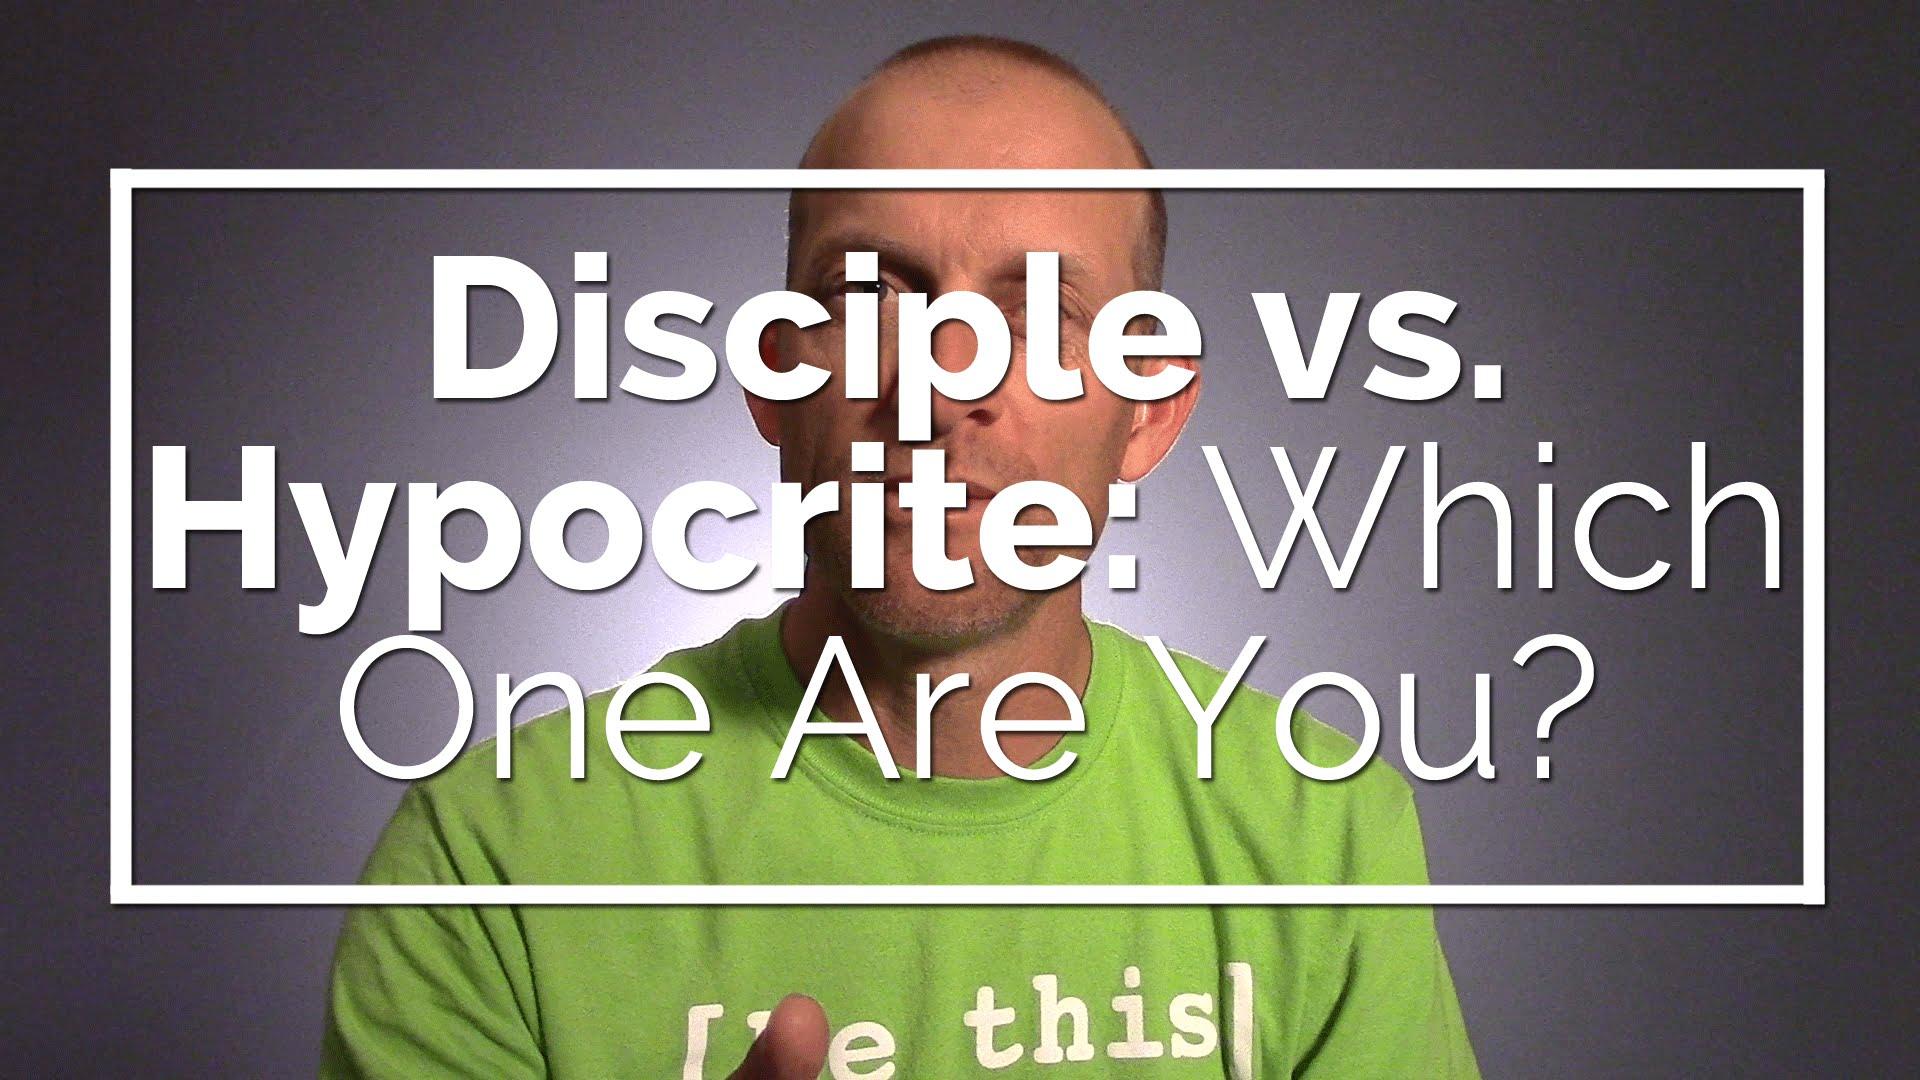 Disciple vs. Hypocrite: Which One Are You?